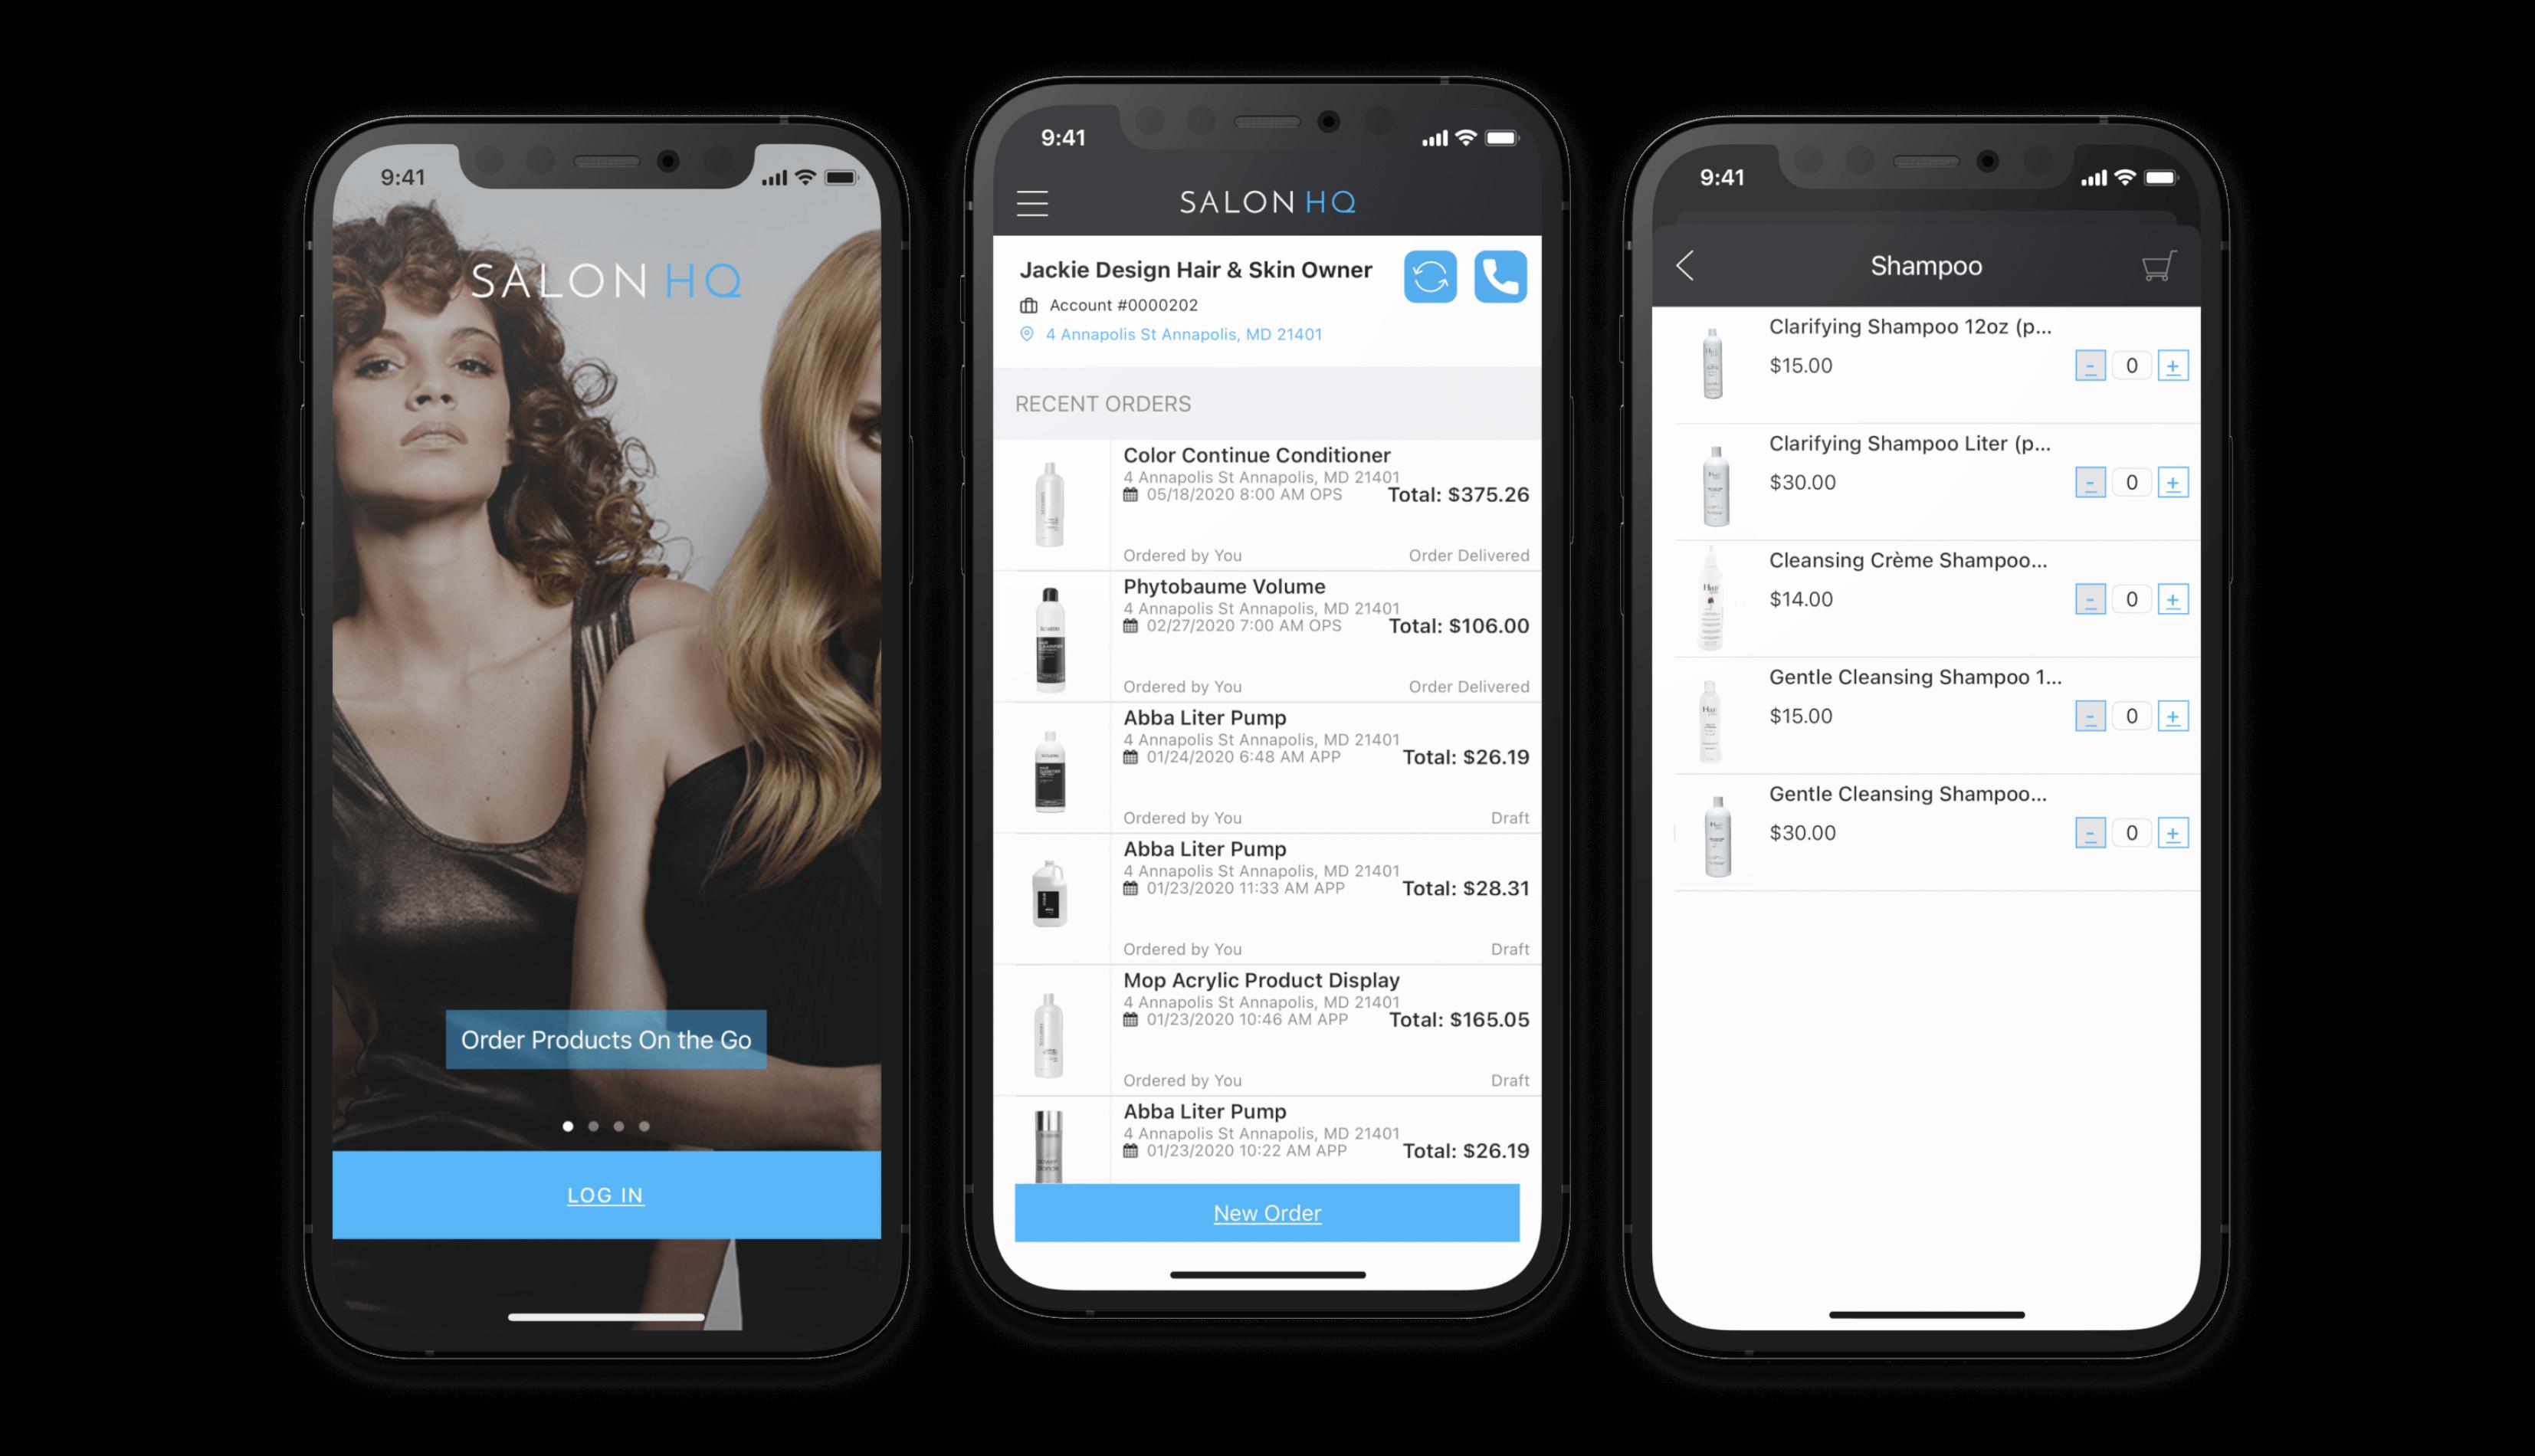 Three phones displaying SalonHQ app